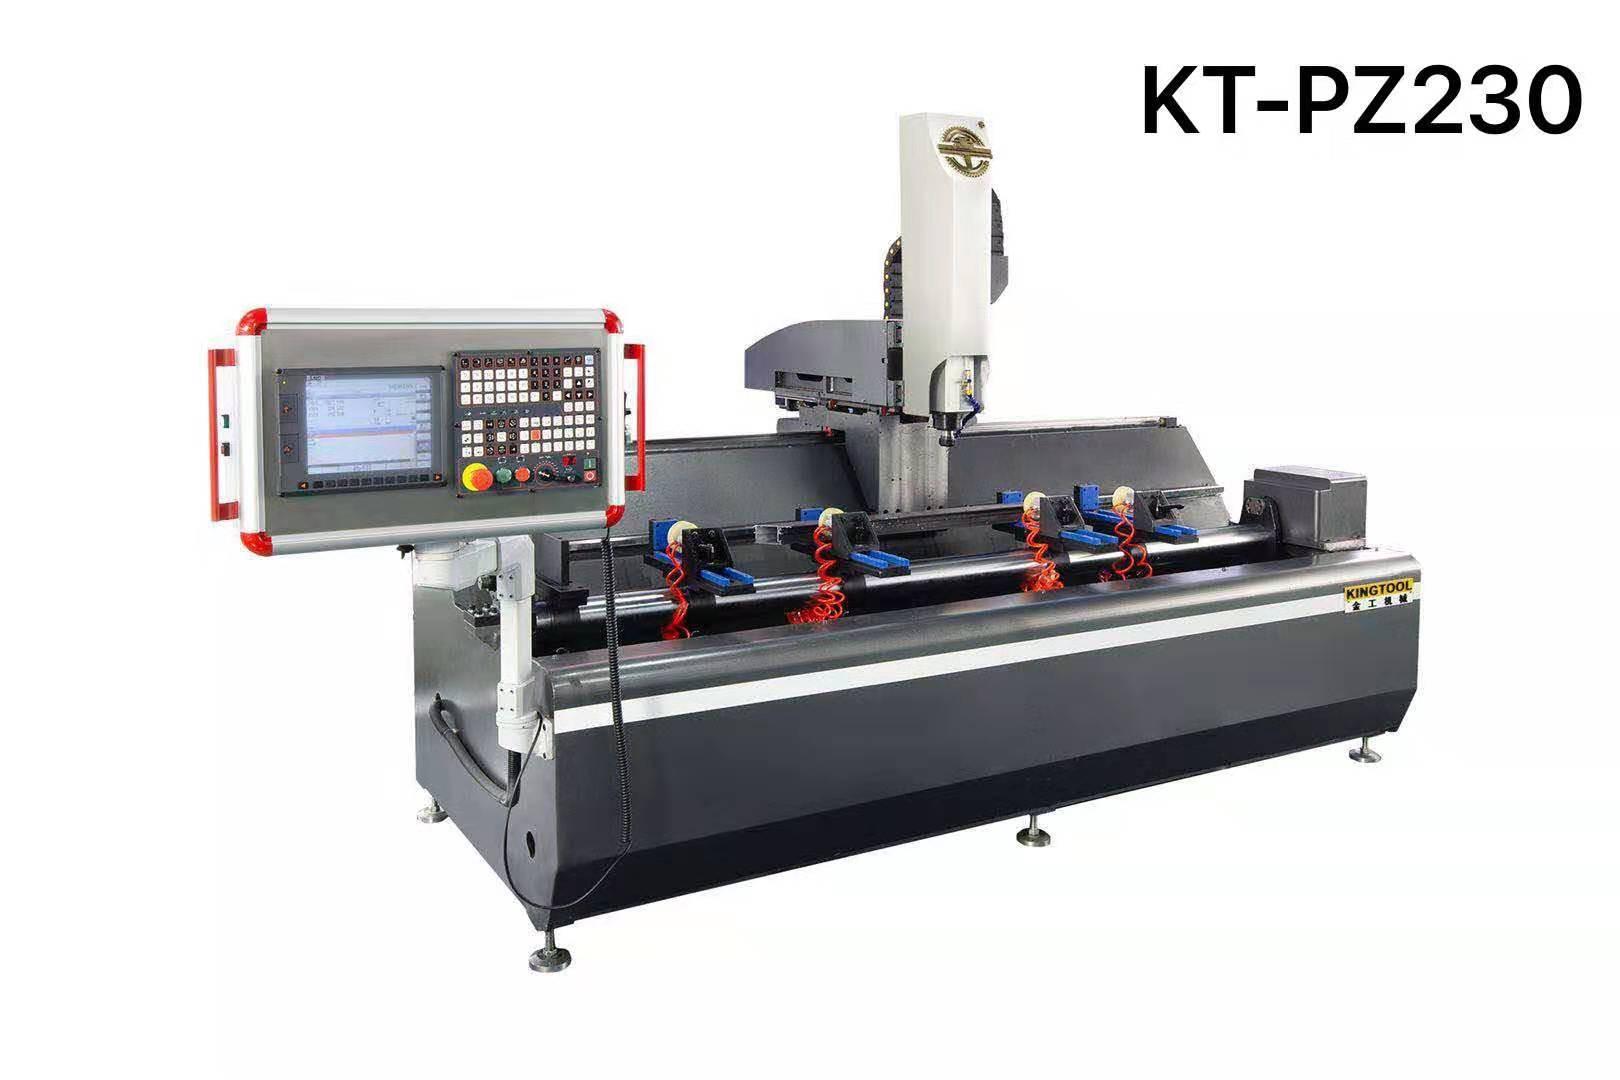 KT-PZ230 3-AXIS CNC MACHINING CENTRE FOR ALUMINUM PROFILE